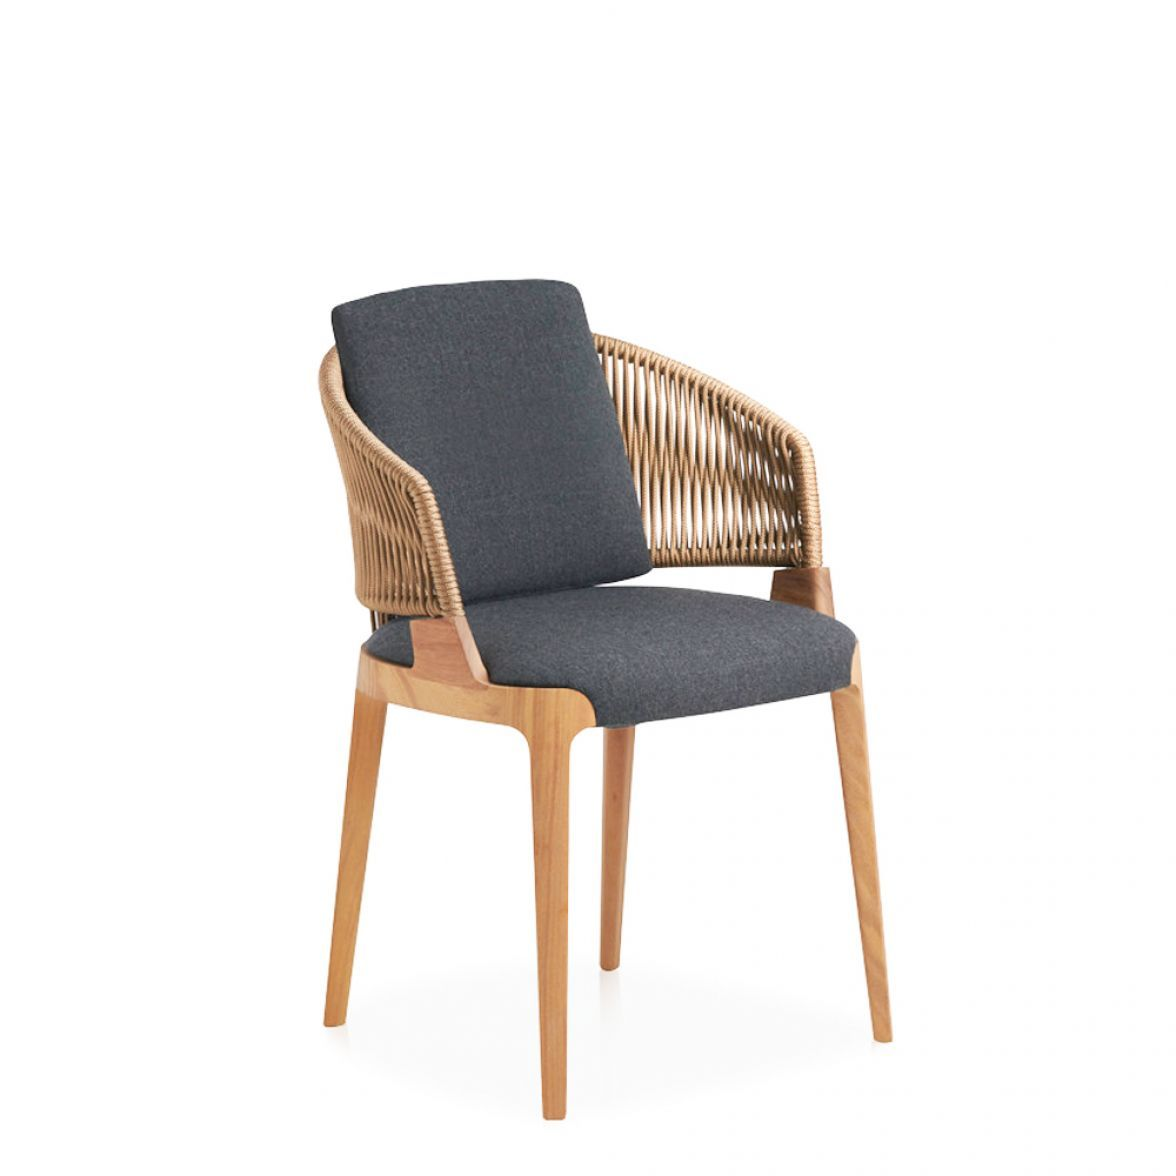 Velis hand weaved armchair